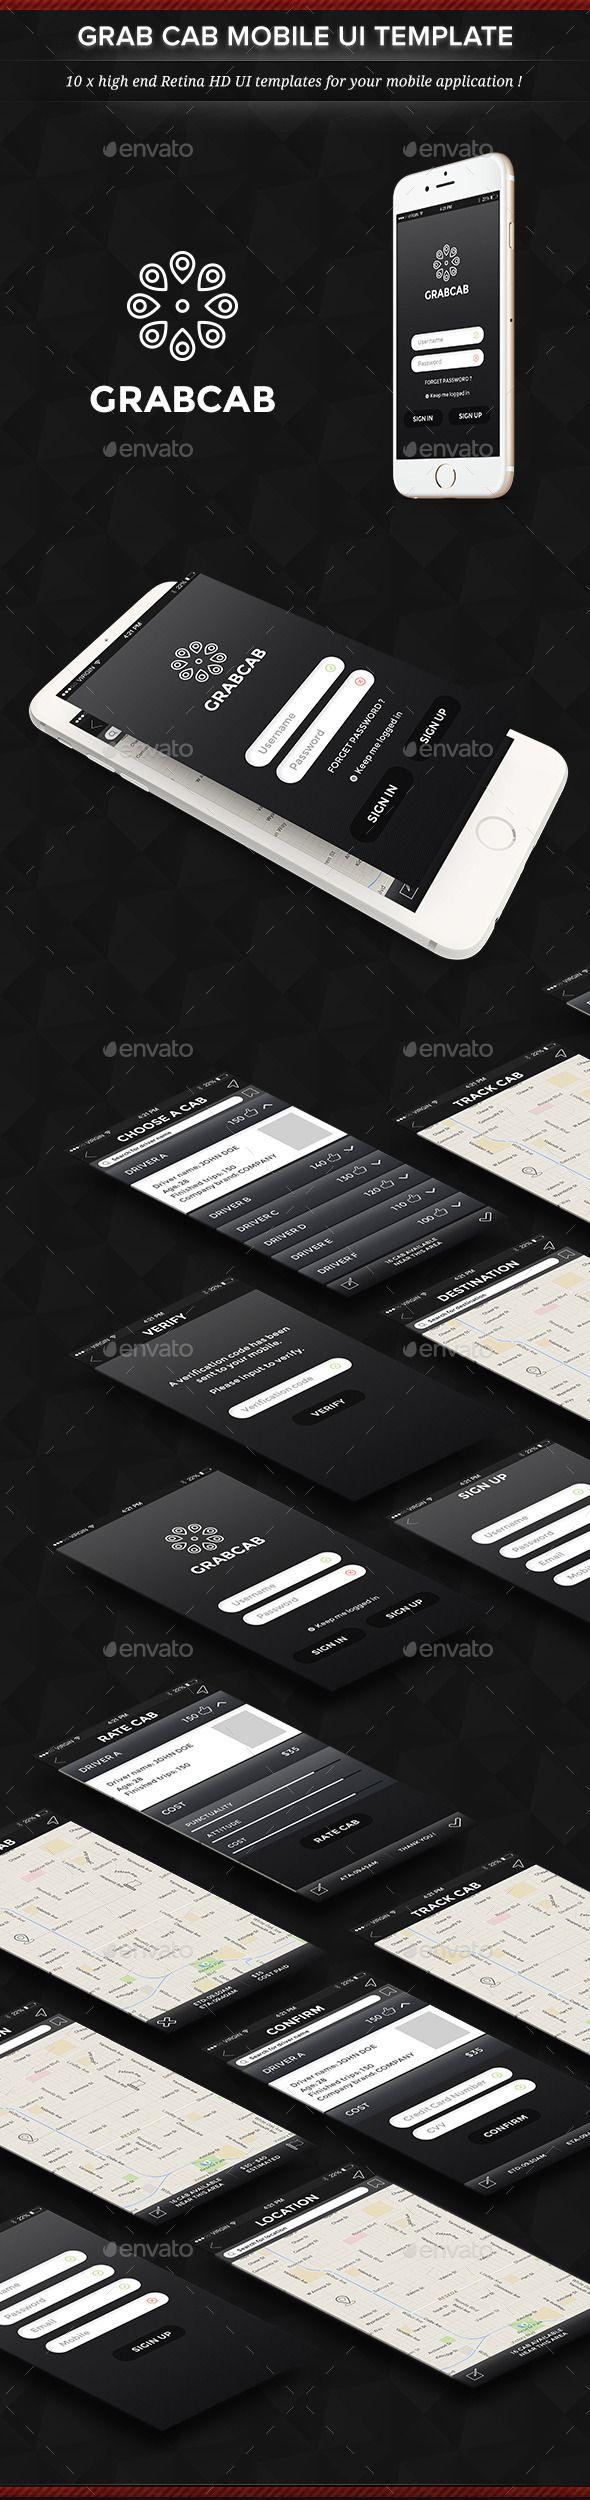 Grab Cab Mobile App User Interface Set